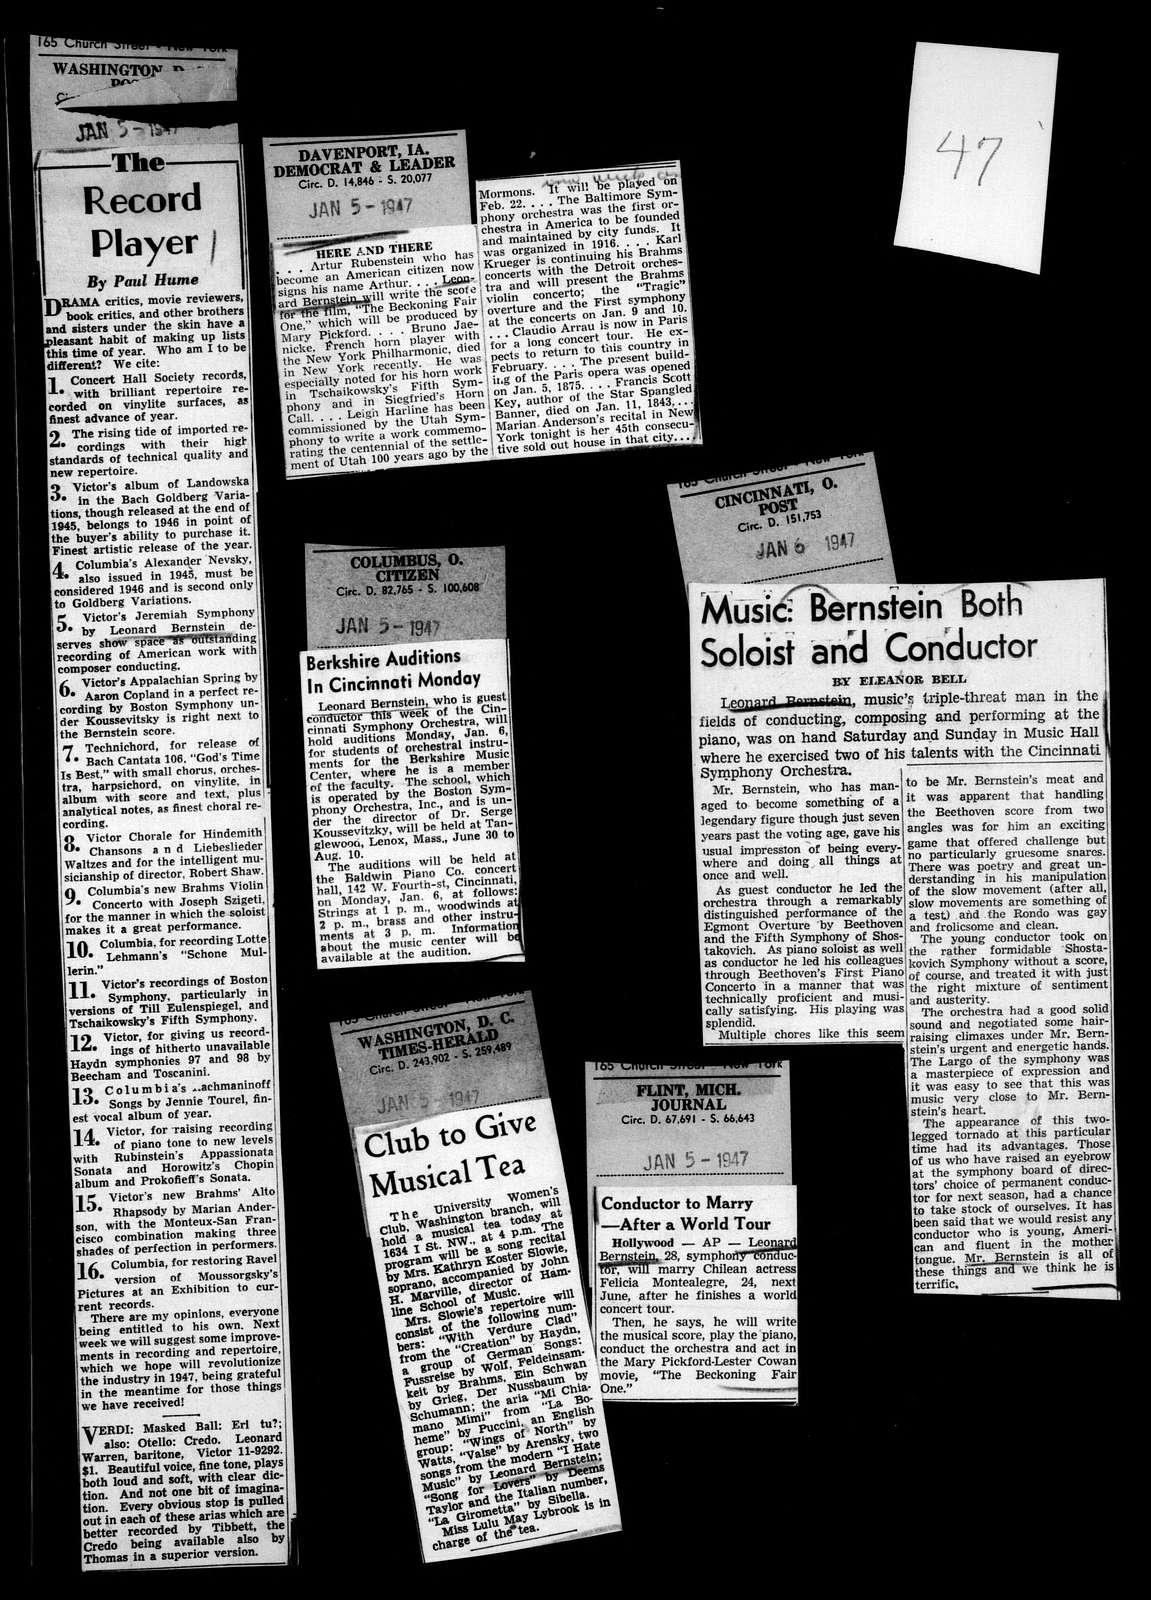 Leonard Bernstein Scrapbook: Book 10. Jan. 1947-